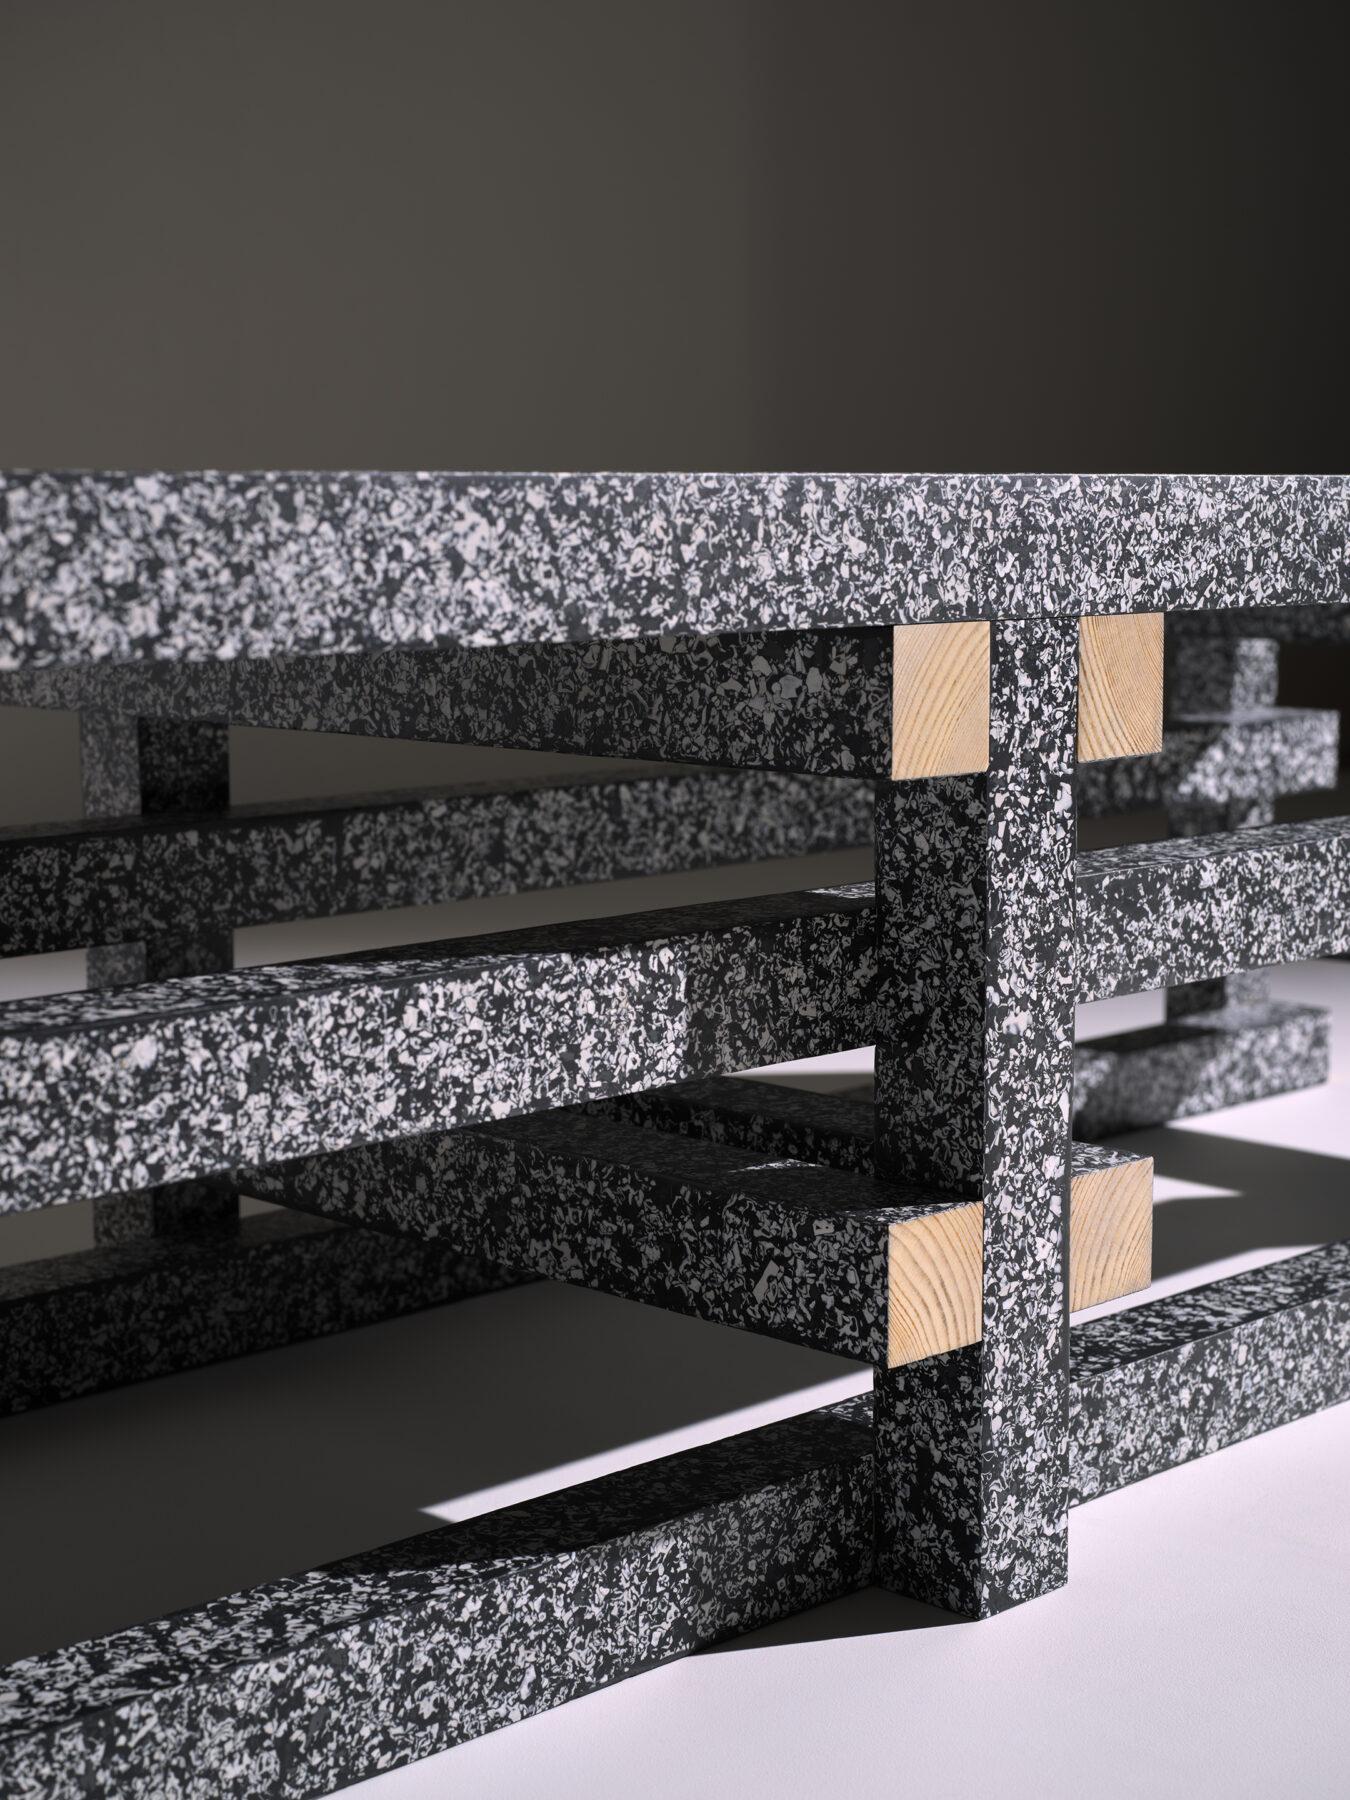 Studio-Kleiner-STUDIO-EO-Table-image-05